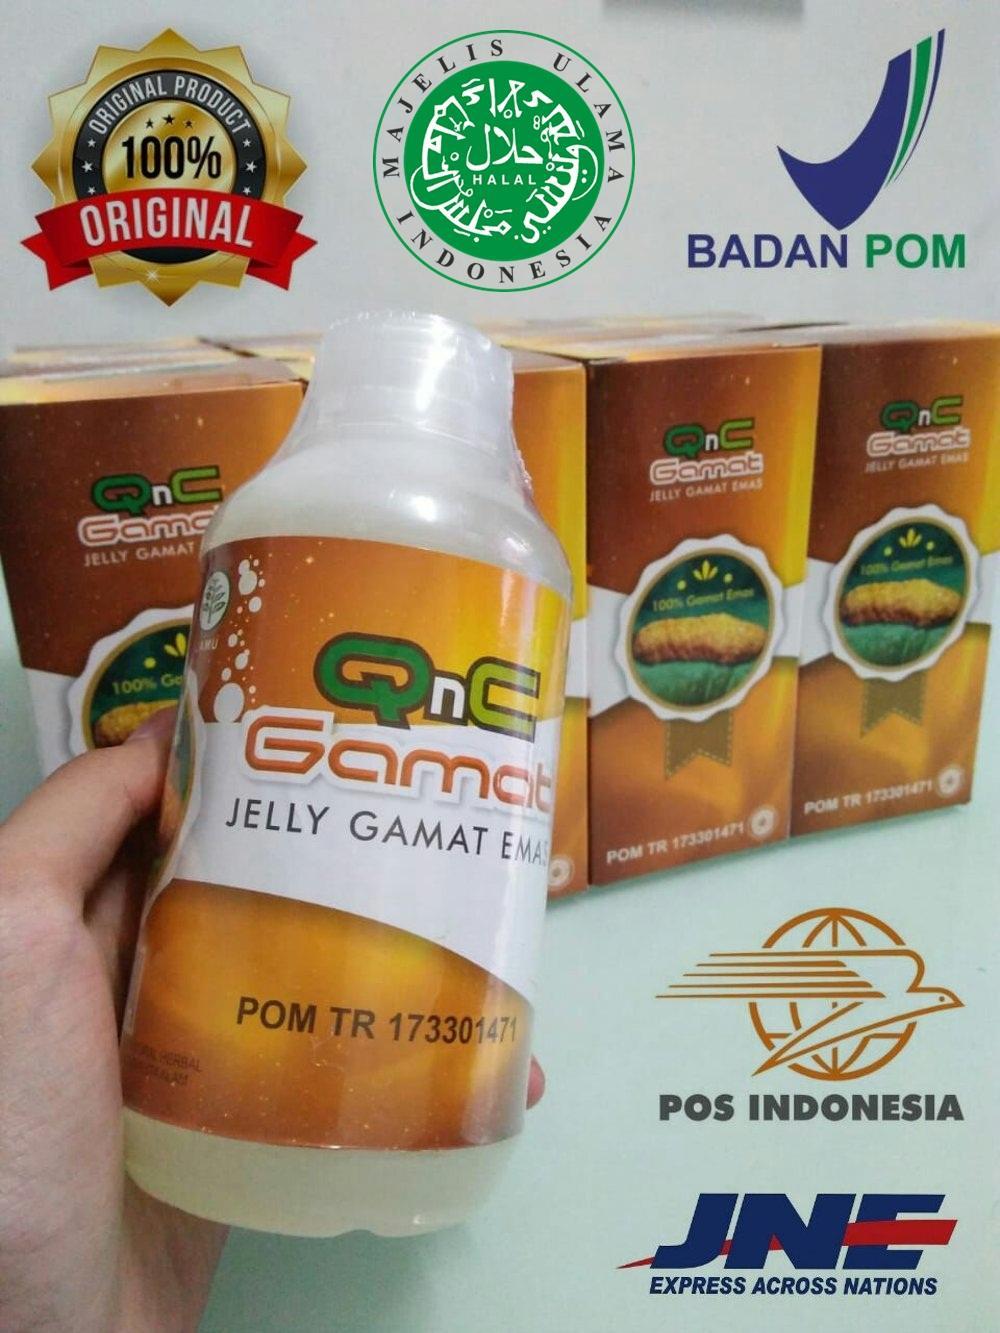 Obat Herbal Diabetes Archives Harga Murah Javabet Luka Gangren Alami Qnc Jelly Gamat 100 Ekstrak Teripang